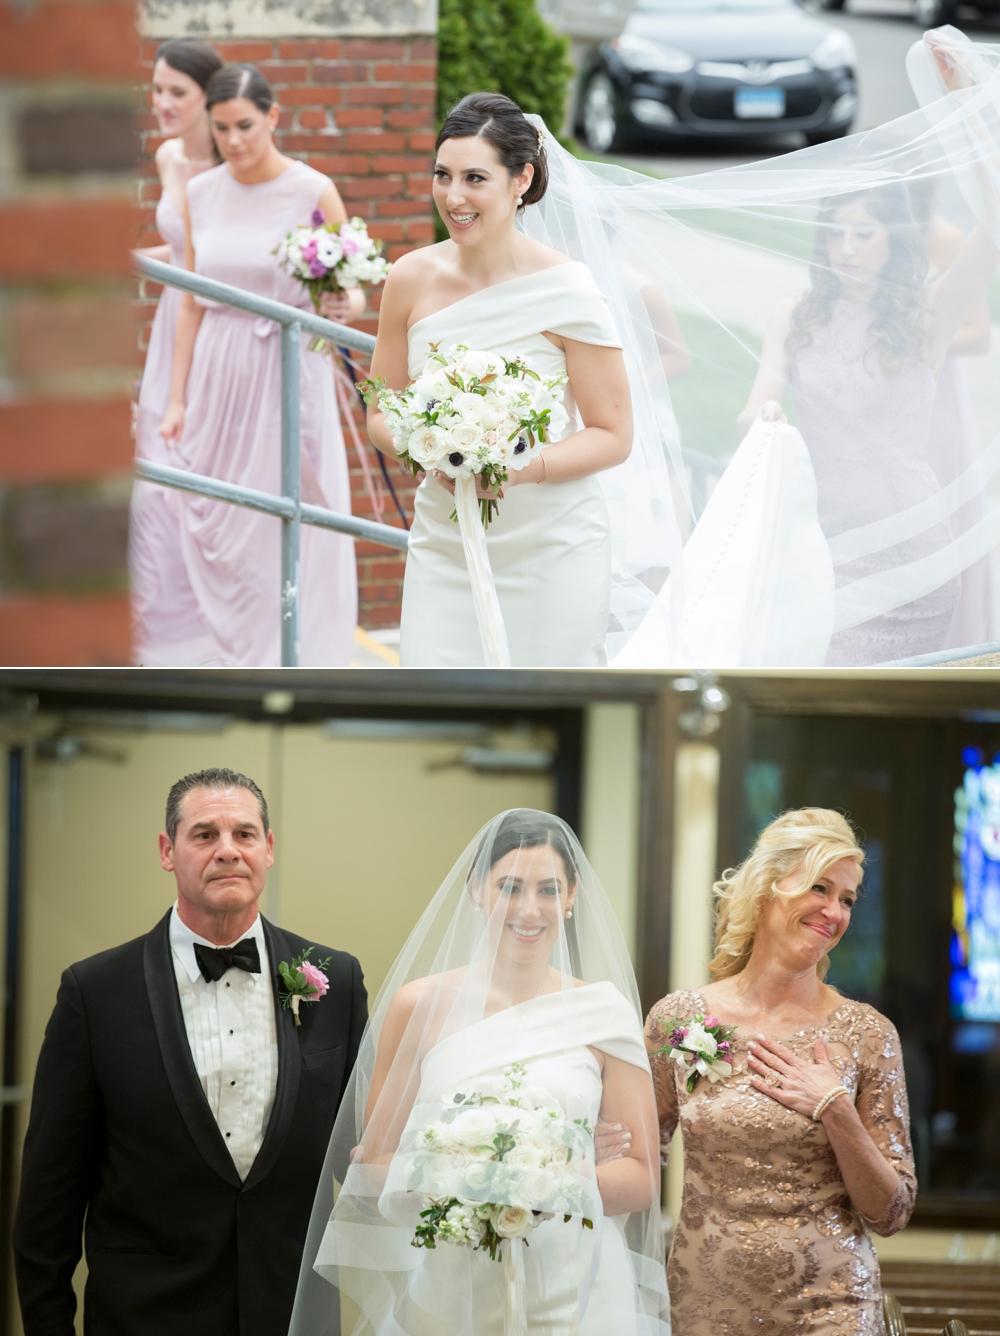 EoilaMansion_Wedding_Leah&Tom_0016.jpg